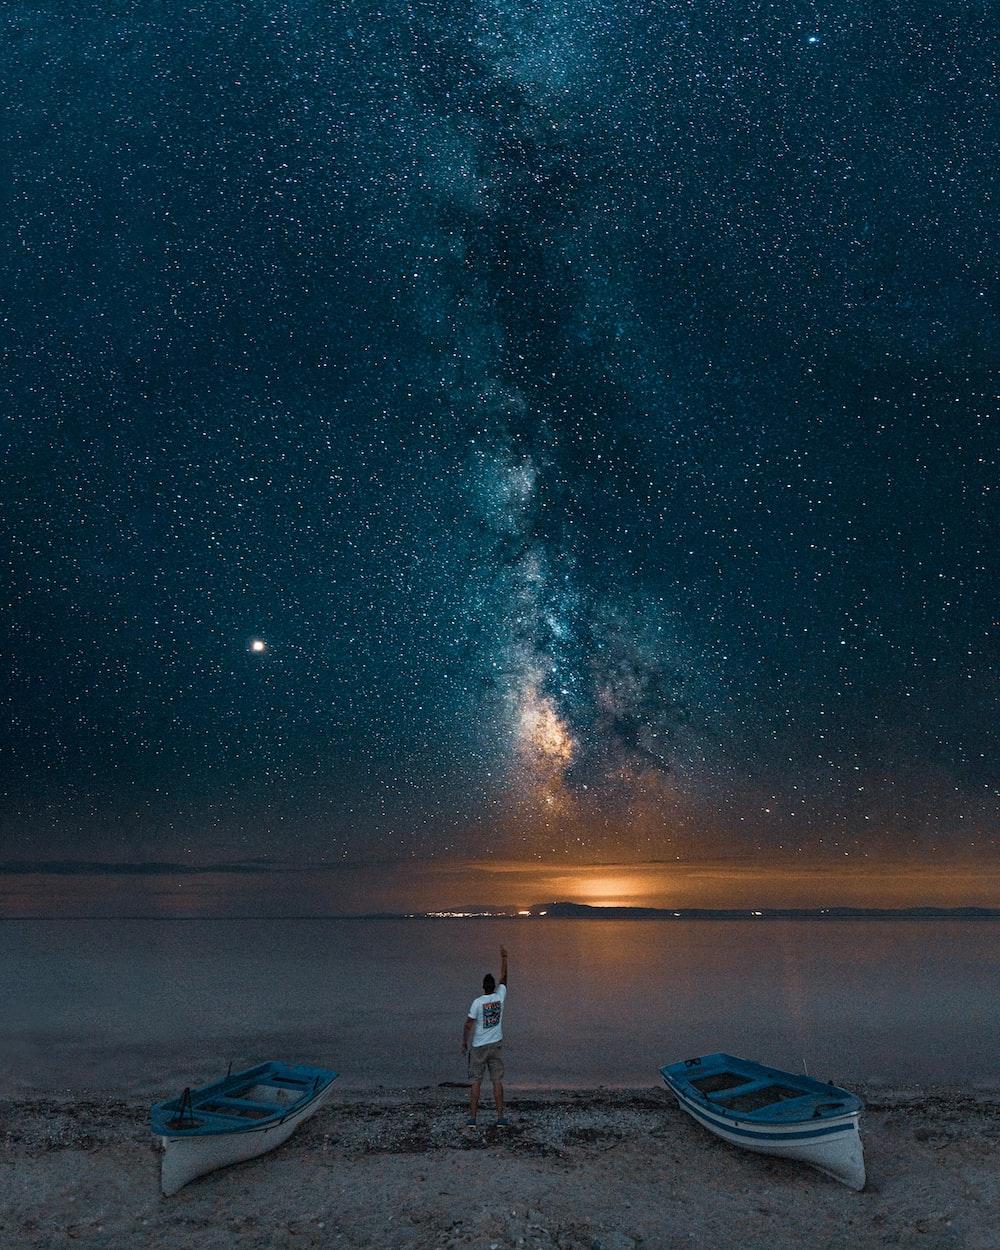 man standing between boats near sea